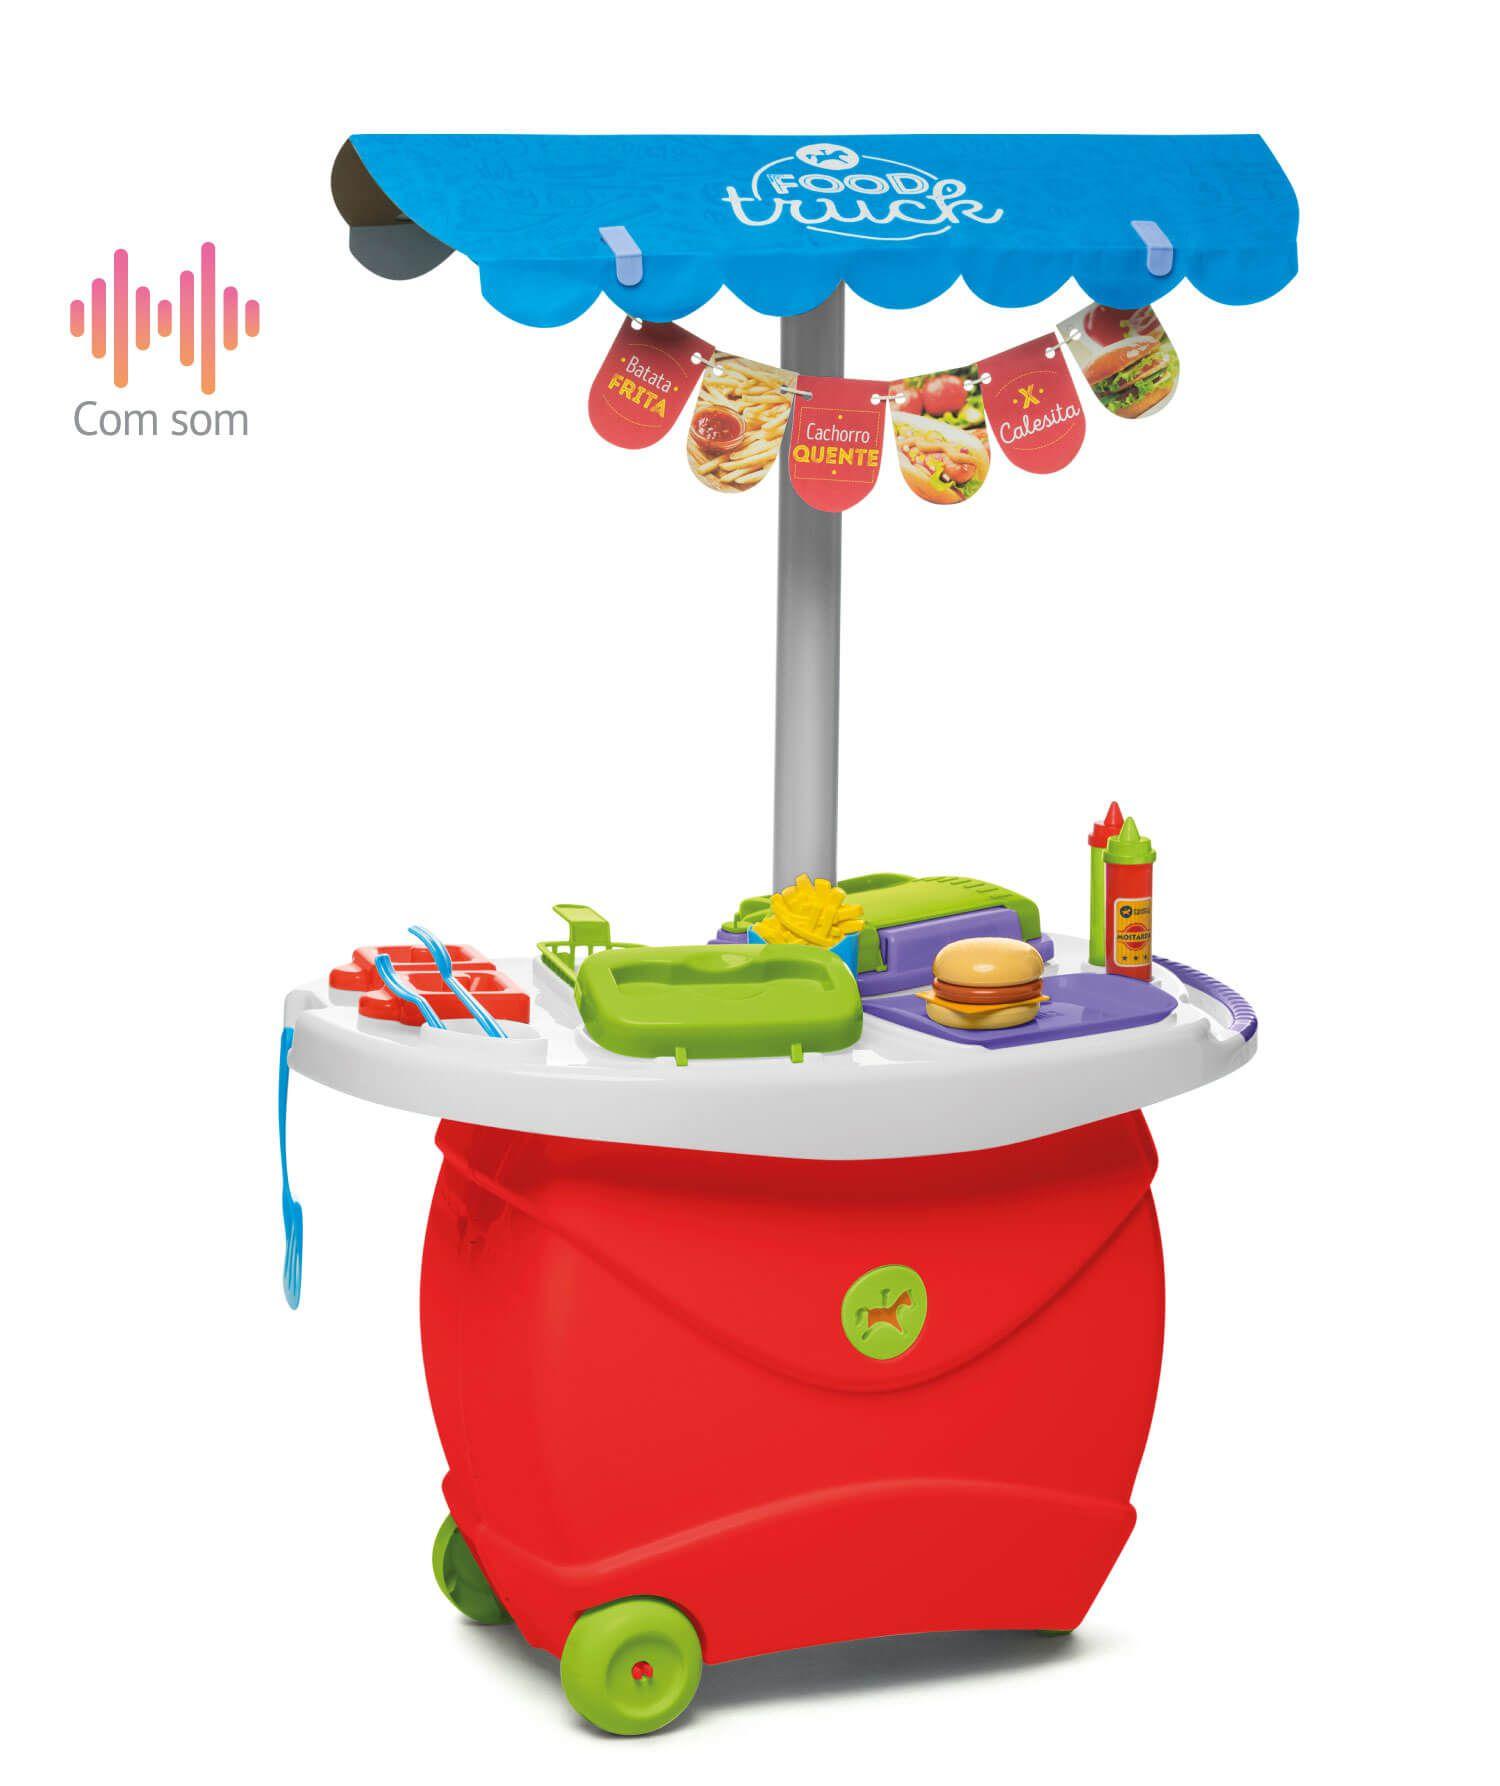 Cozinha Infantil Food Truck Colorida - TA TE TI 353